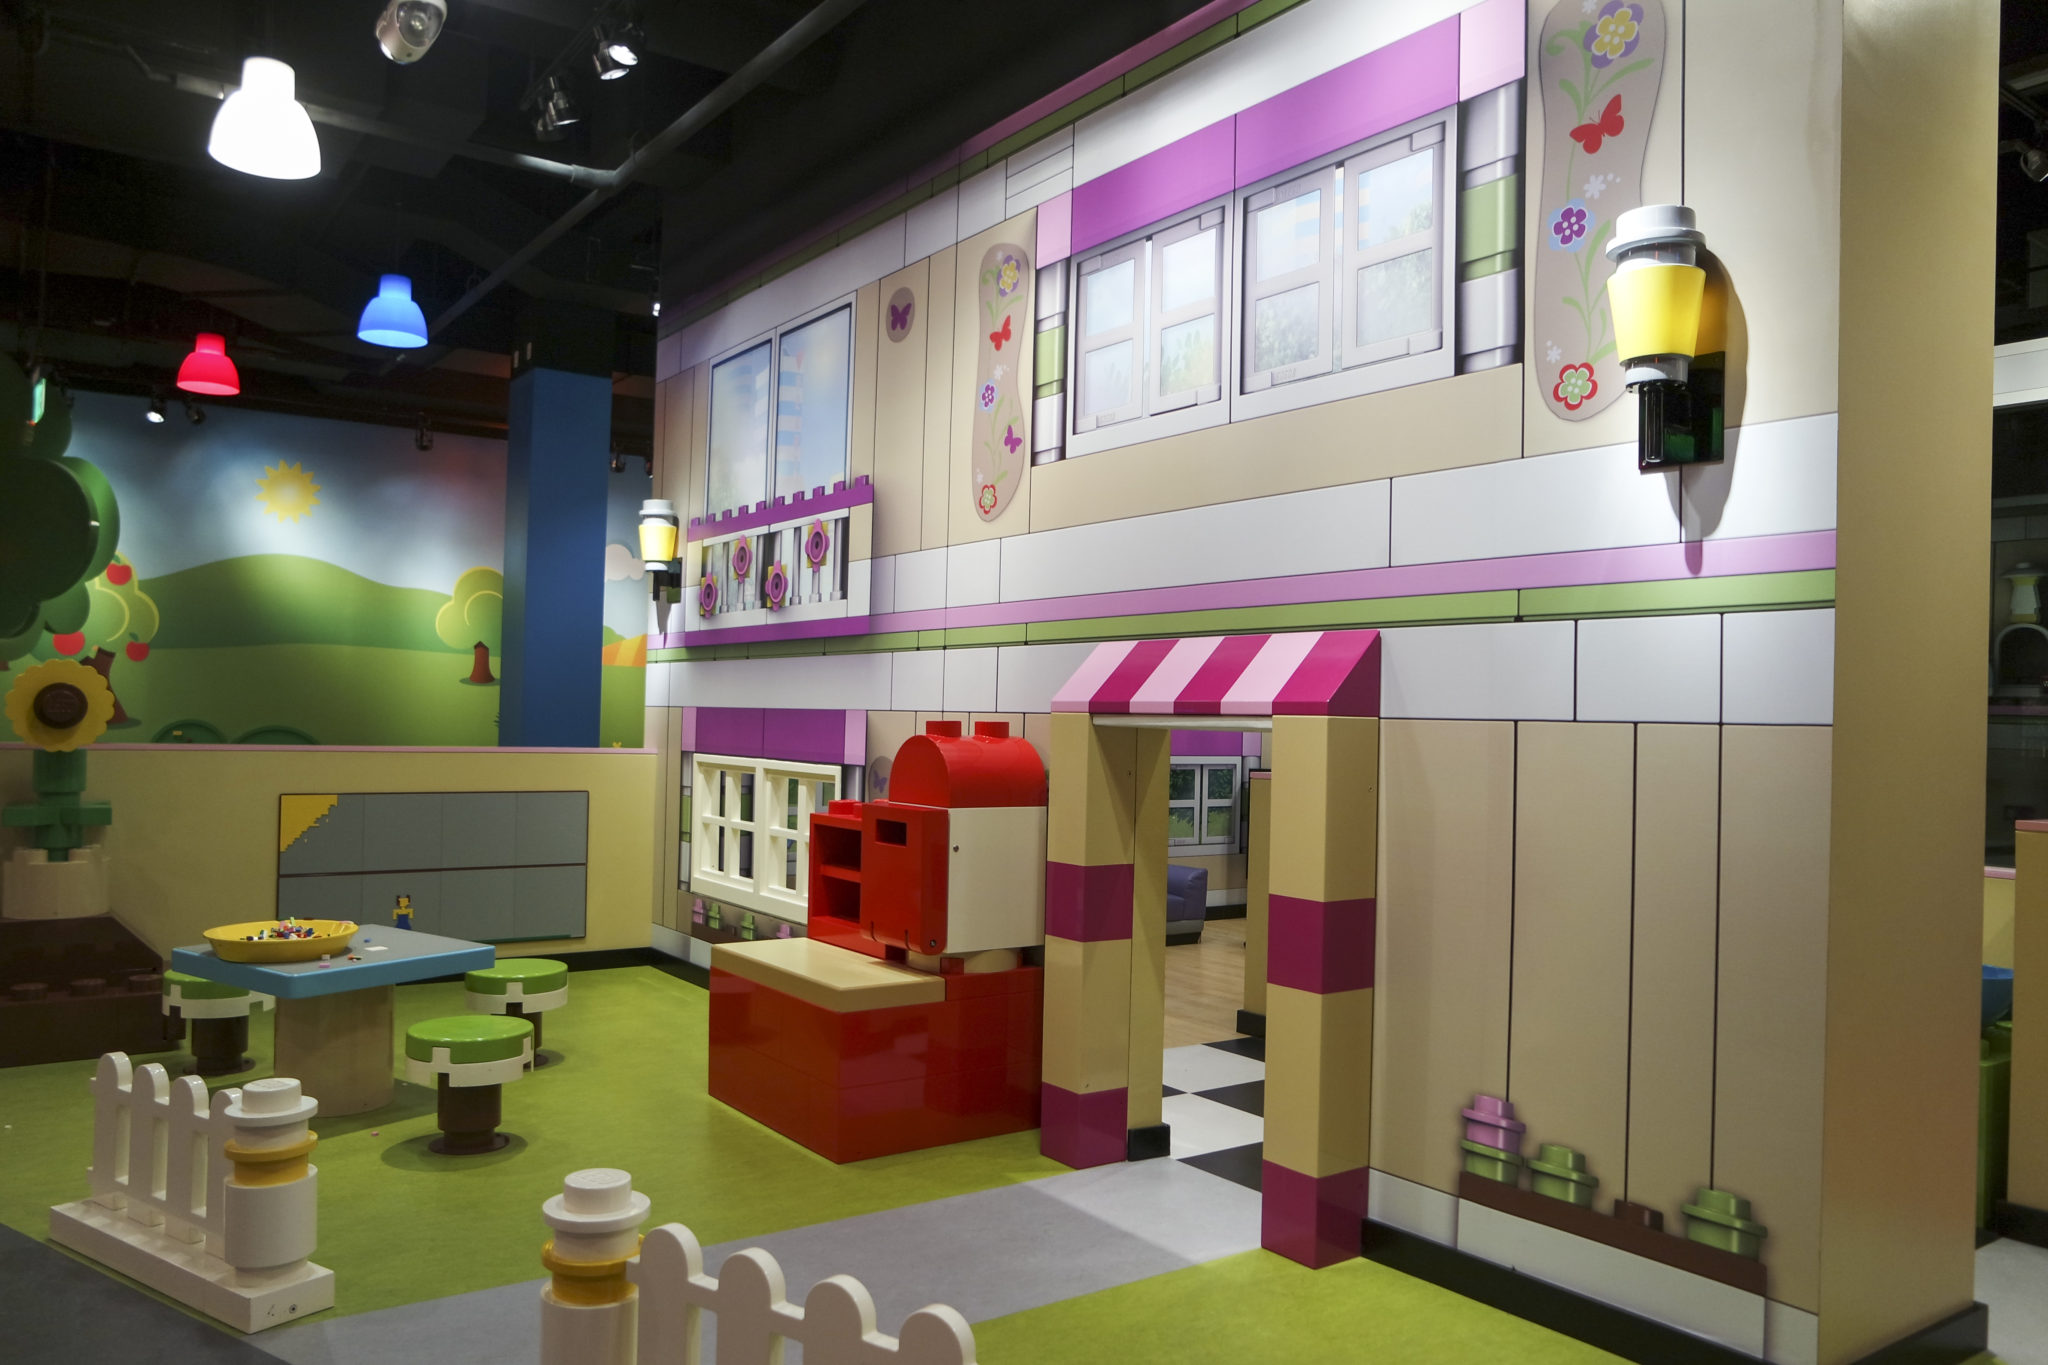 LEGOLAND Discovery Center Boston LEGO Friends Olivia's House